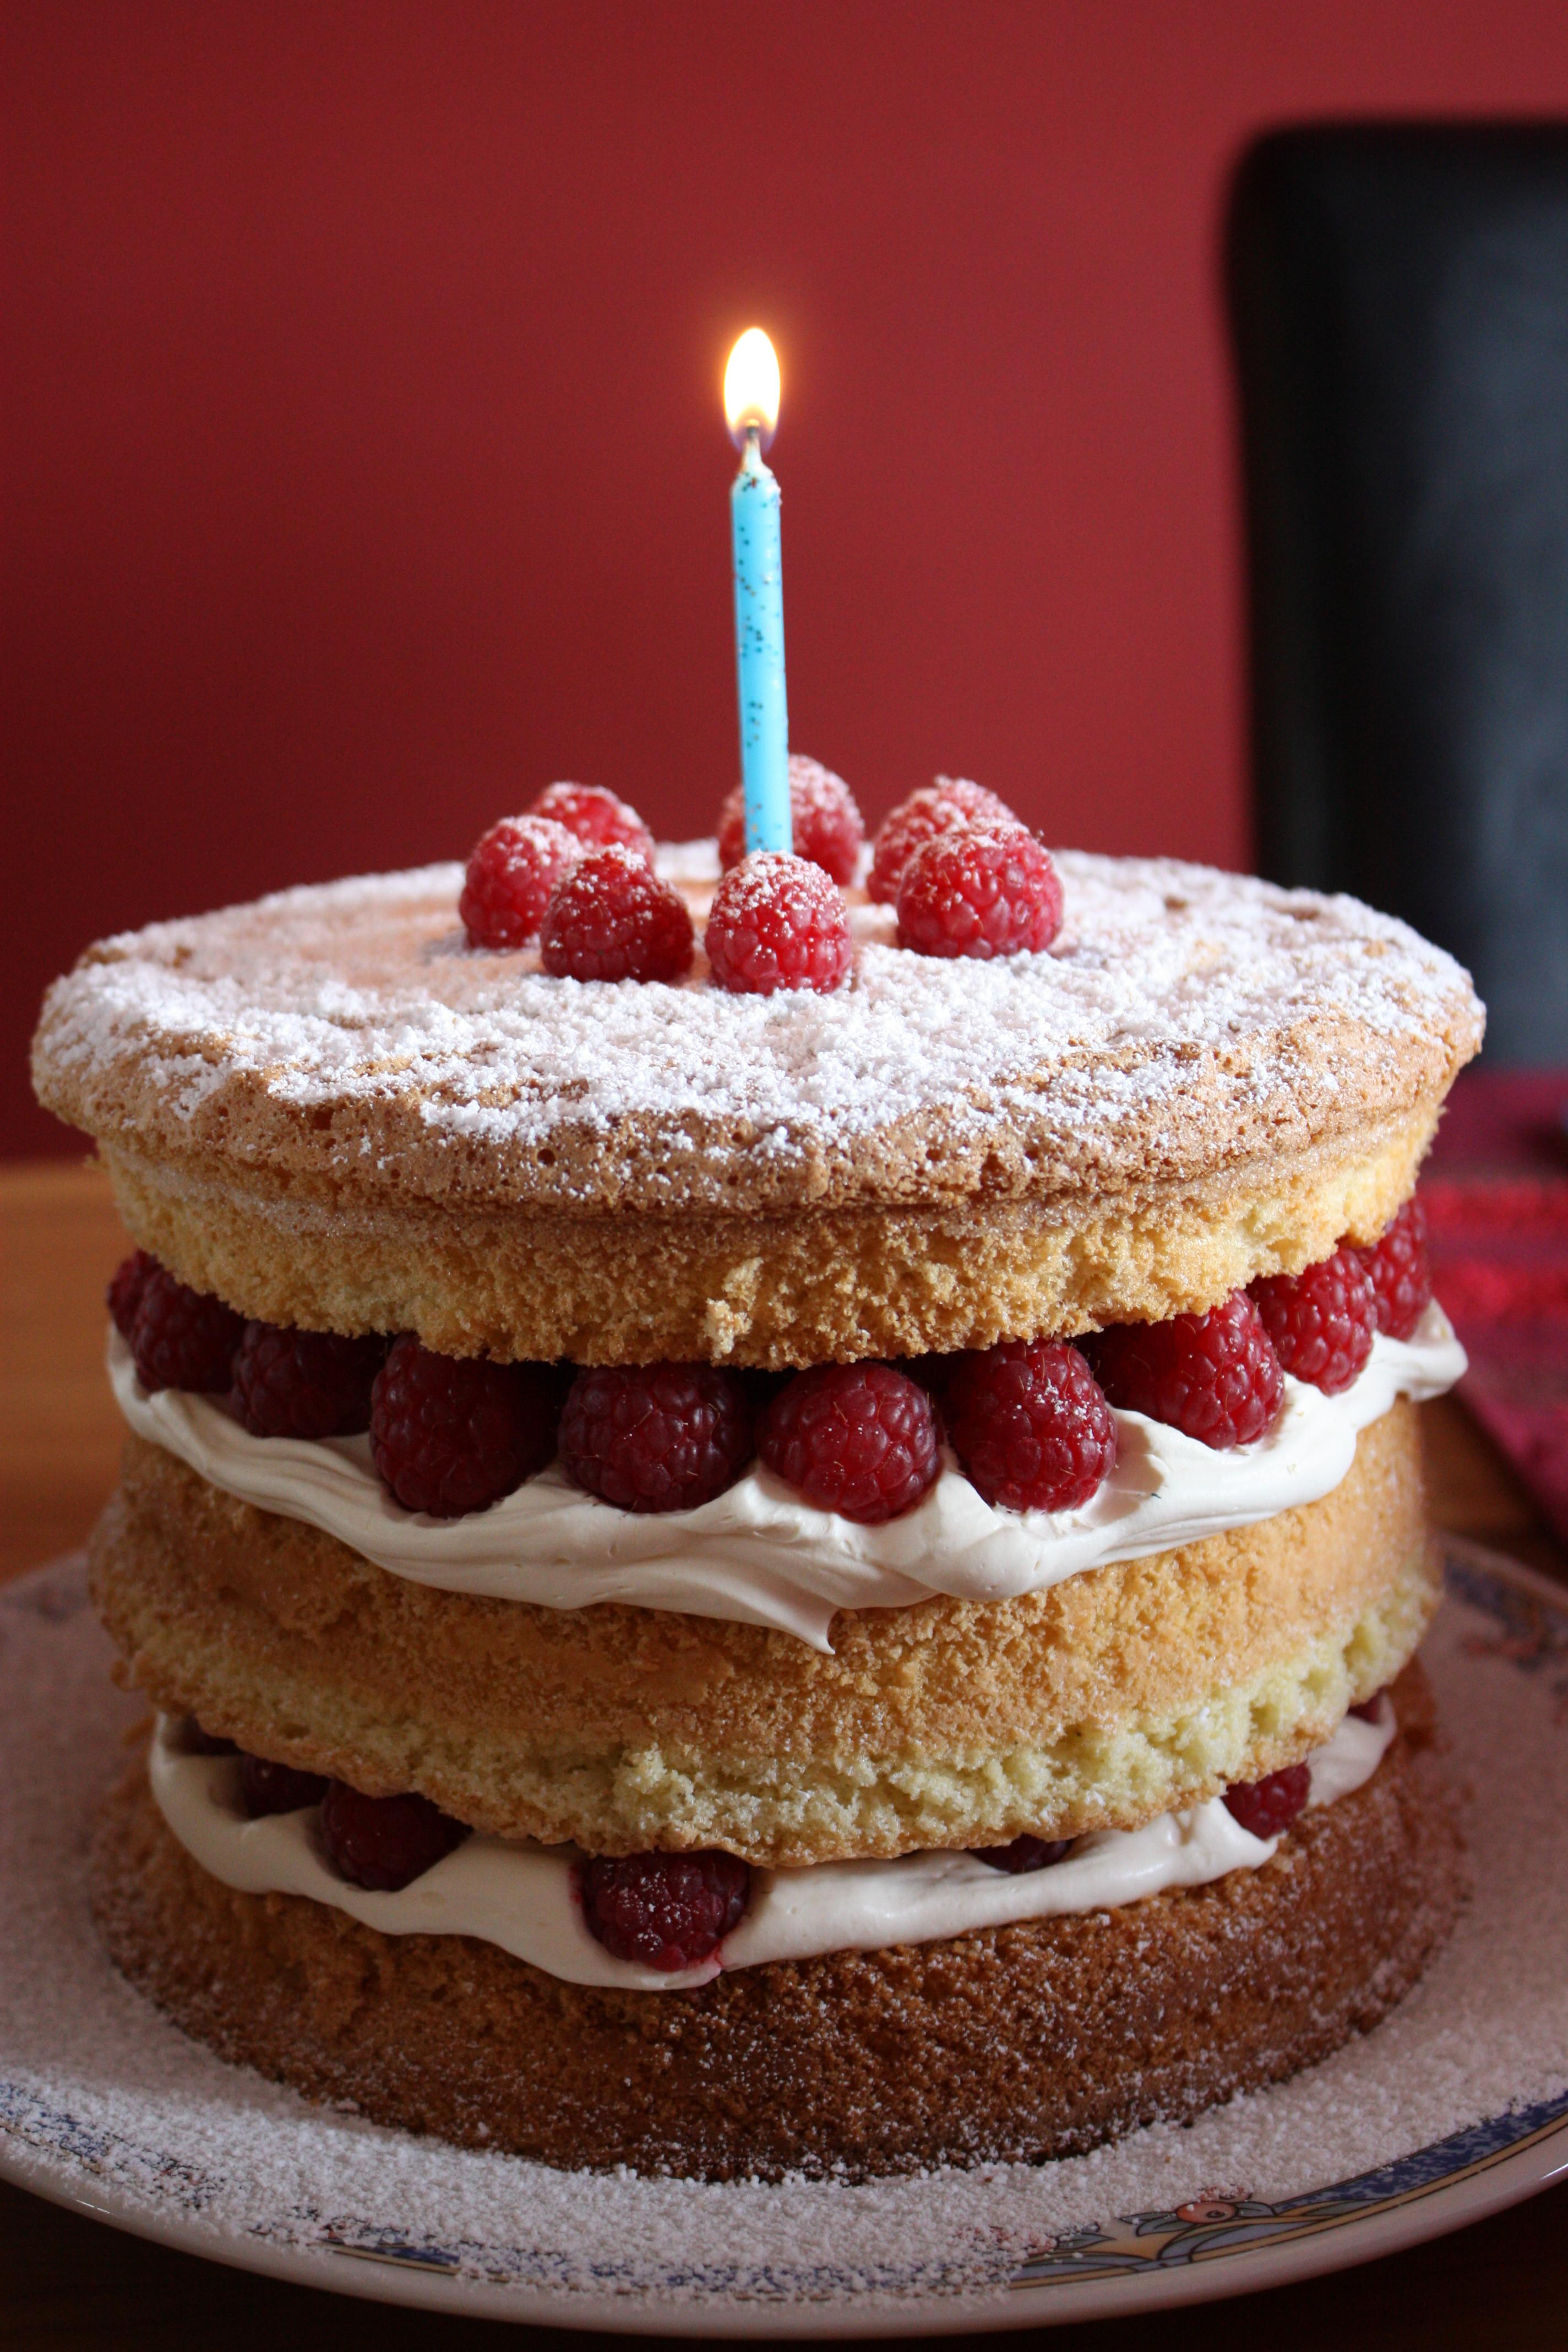 When Did Adding Candles To The Birthday Cake Originated  File Birthday cake Downpatrick April 2010 02 JPG